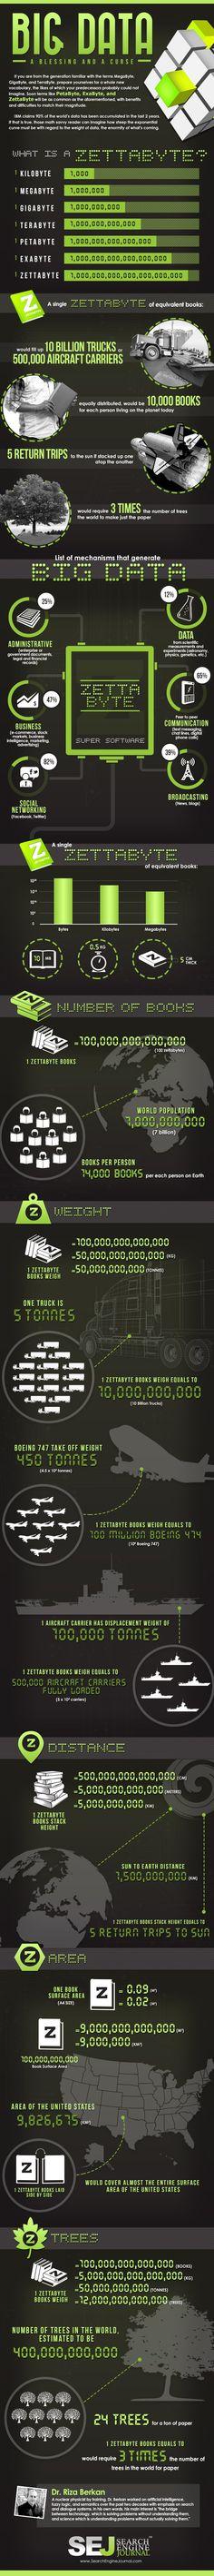 How Big Is Big Data? #BigData #infographic